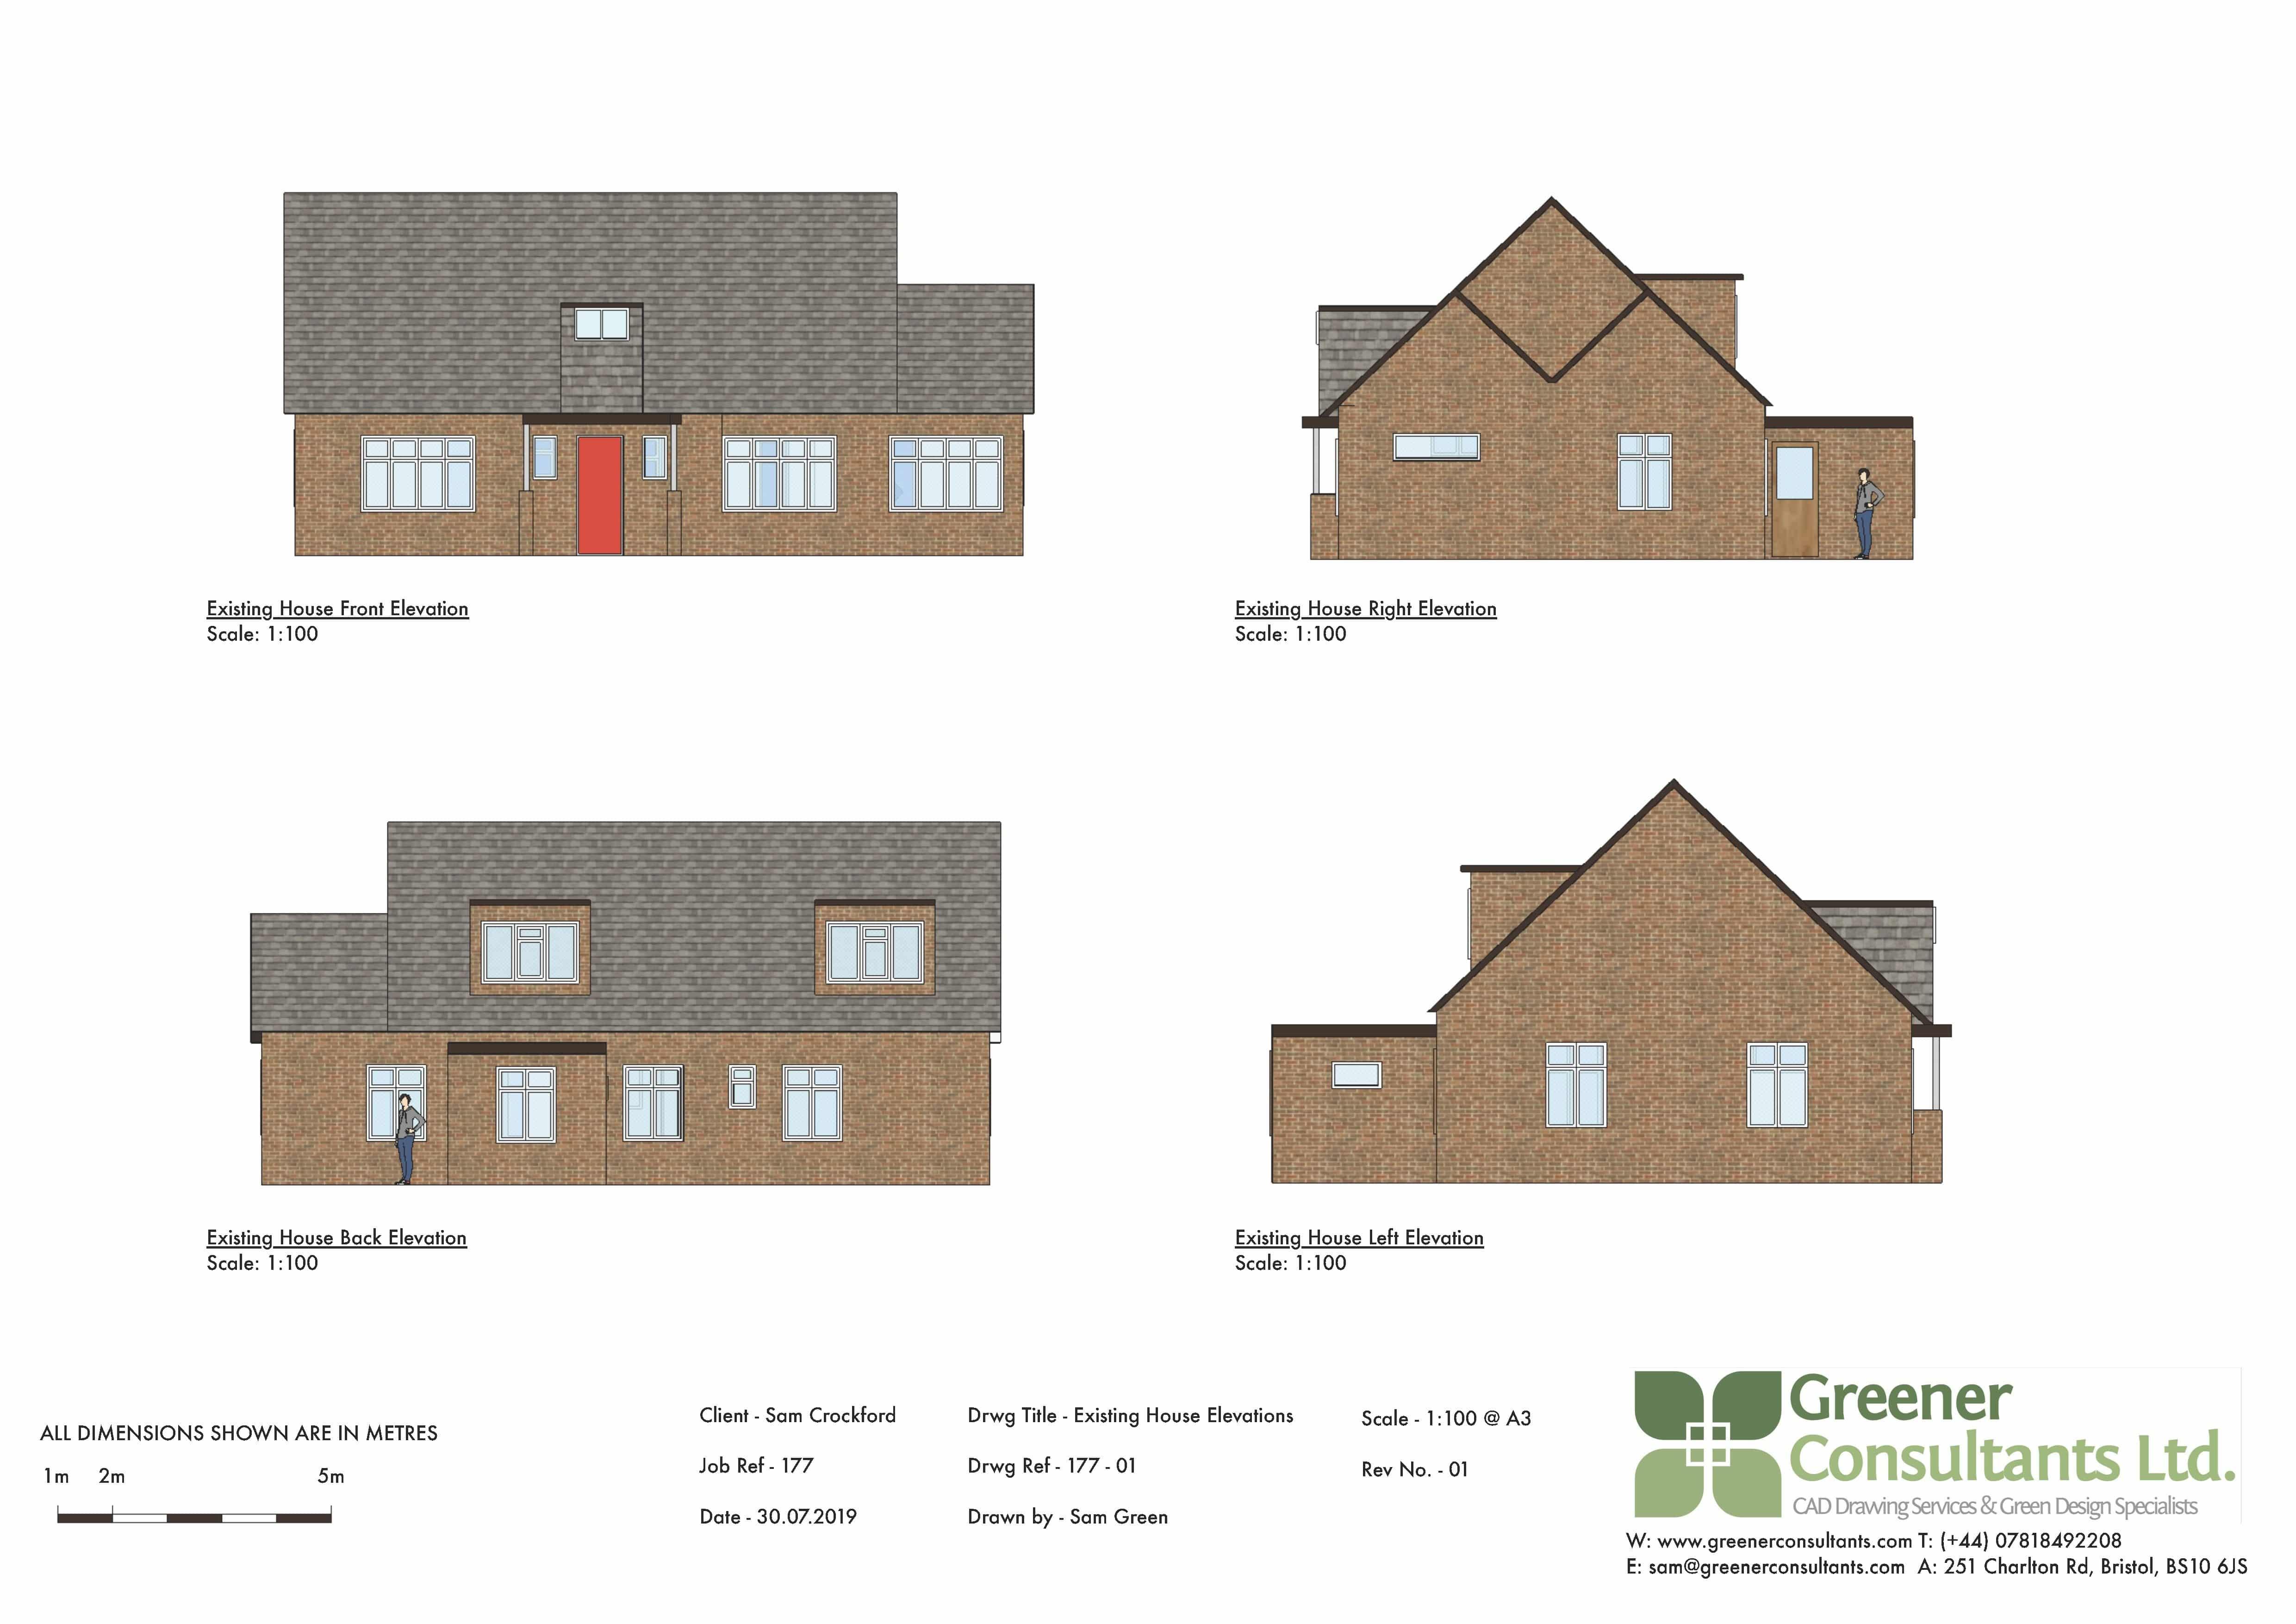 bristol elevations, extensions, buckinghamshire, floor plans